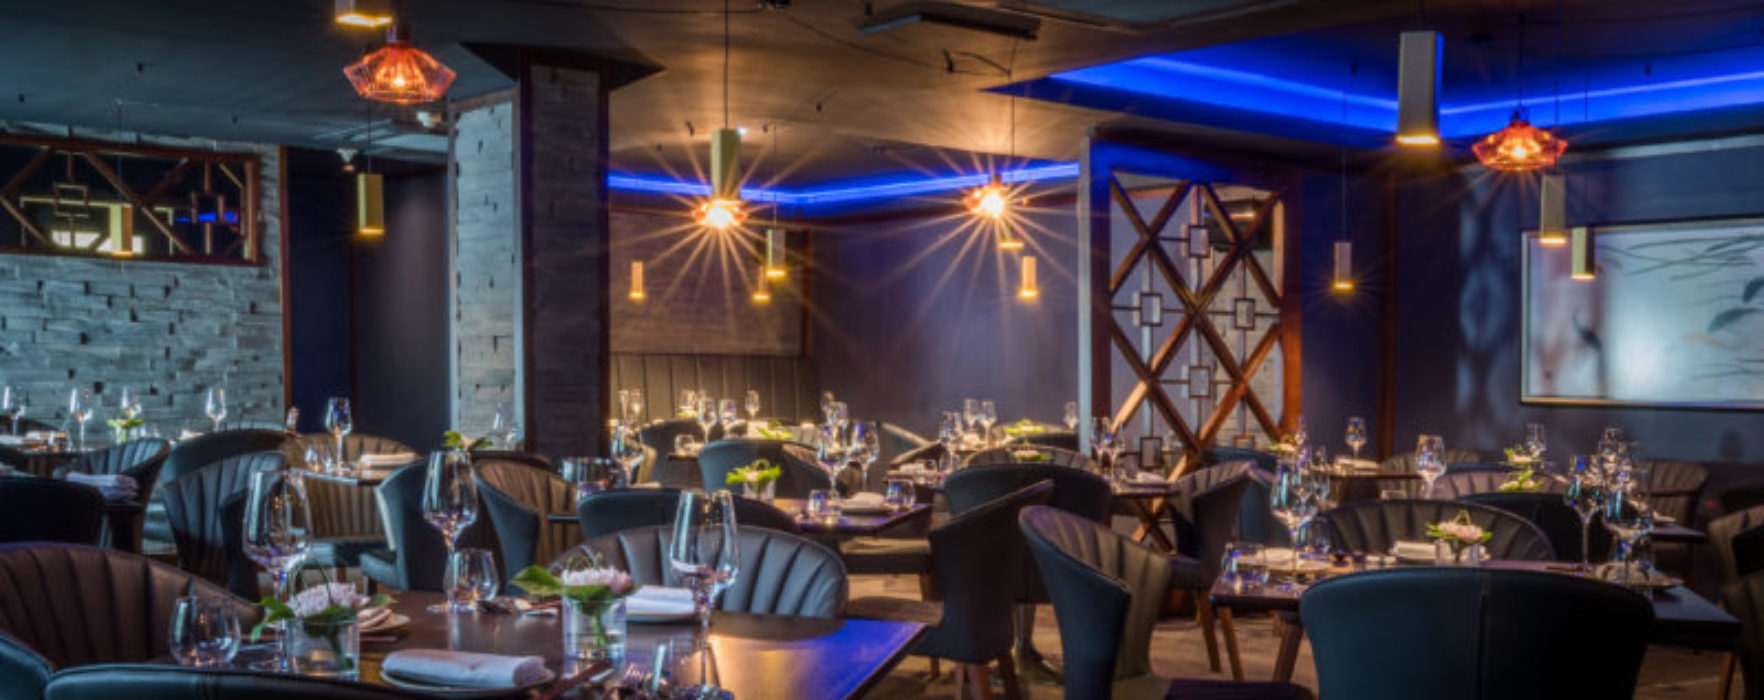 CHESHIRE: Copster Green's hidden gem Yu reveals its culinary secrets